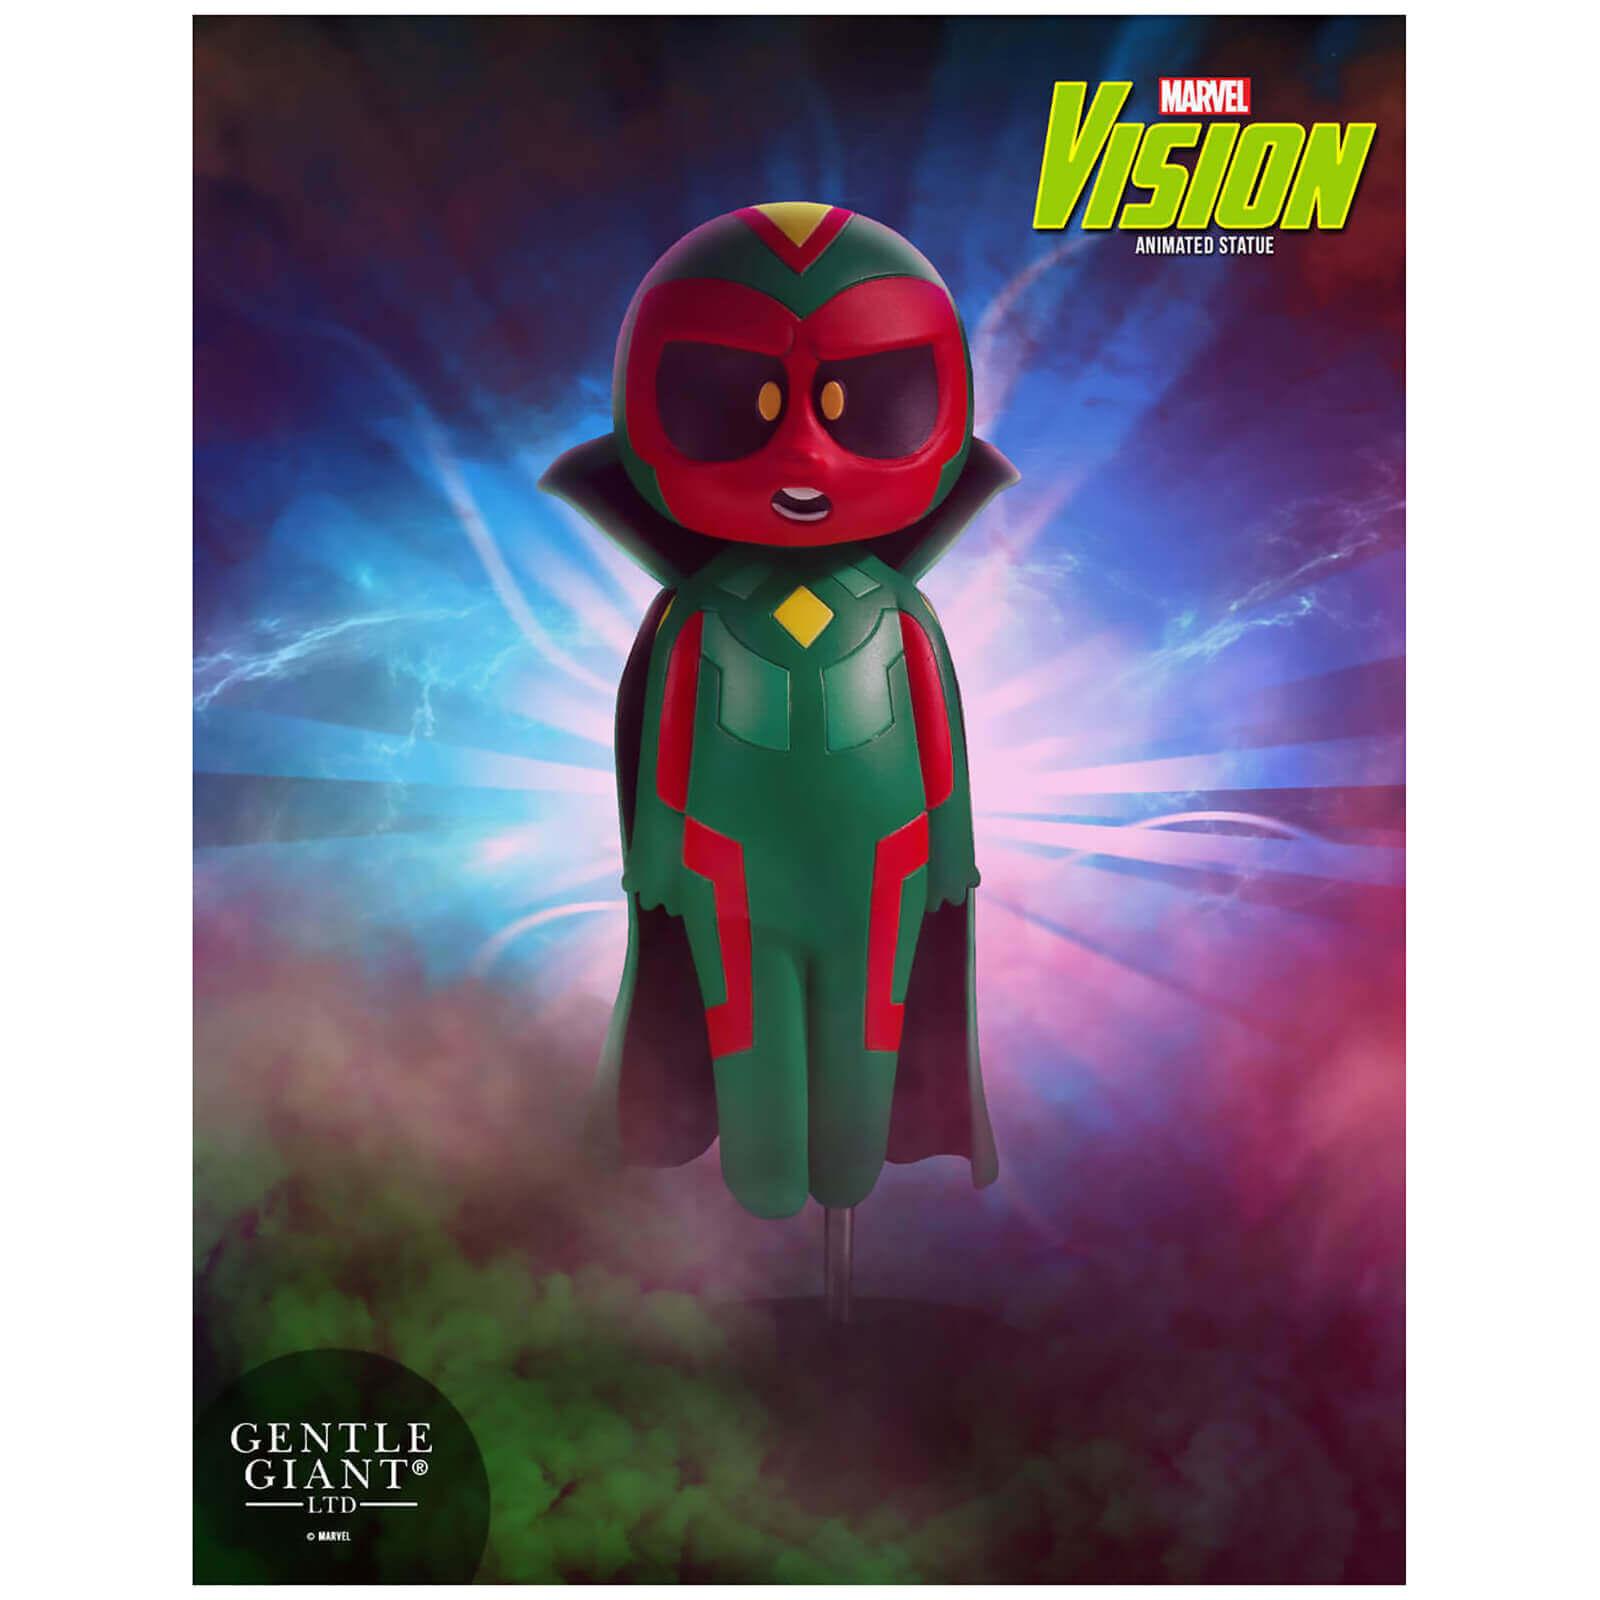 Gentle Giant Marvel Avengers Vision Animated Statue - 15cm für 16,46€ @ Zavvi